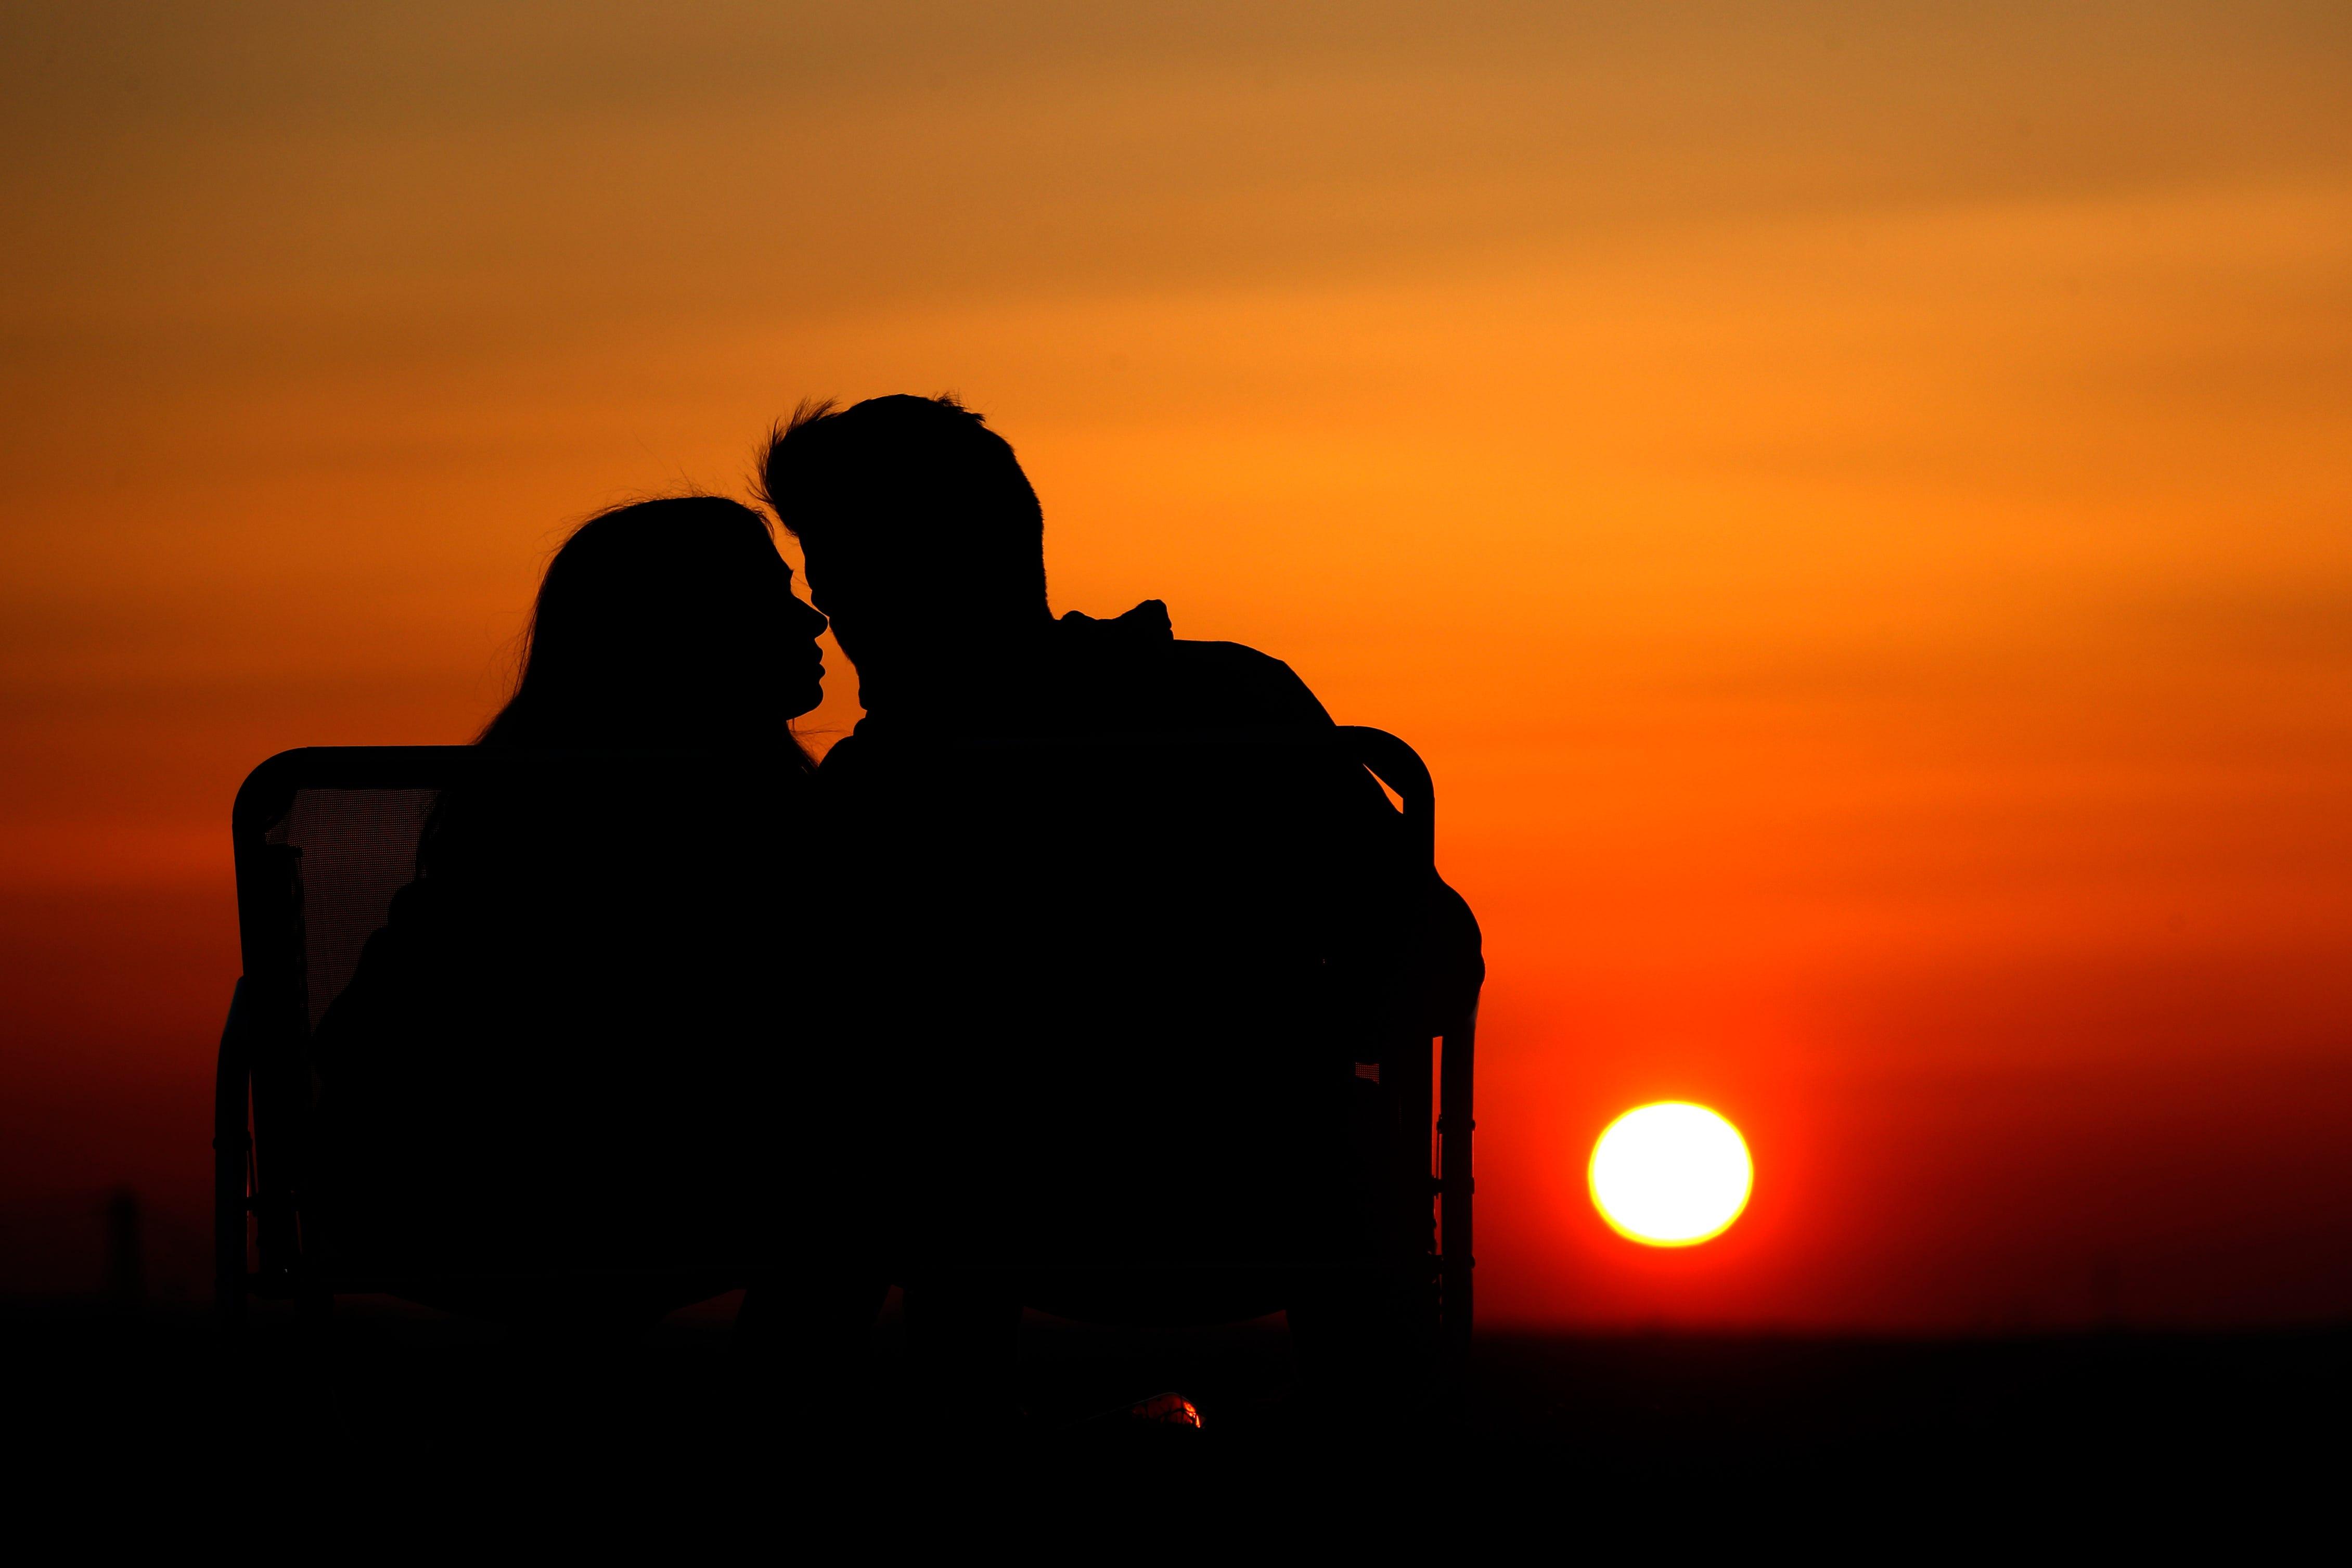 Asculta radio minisat online dating